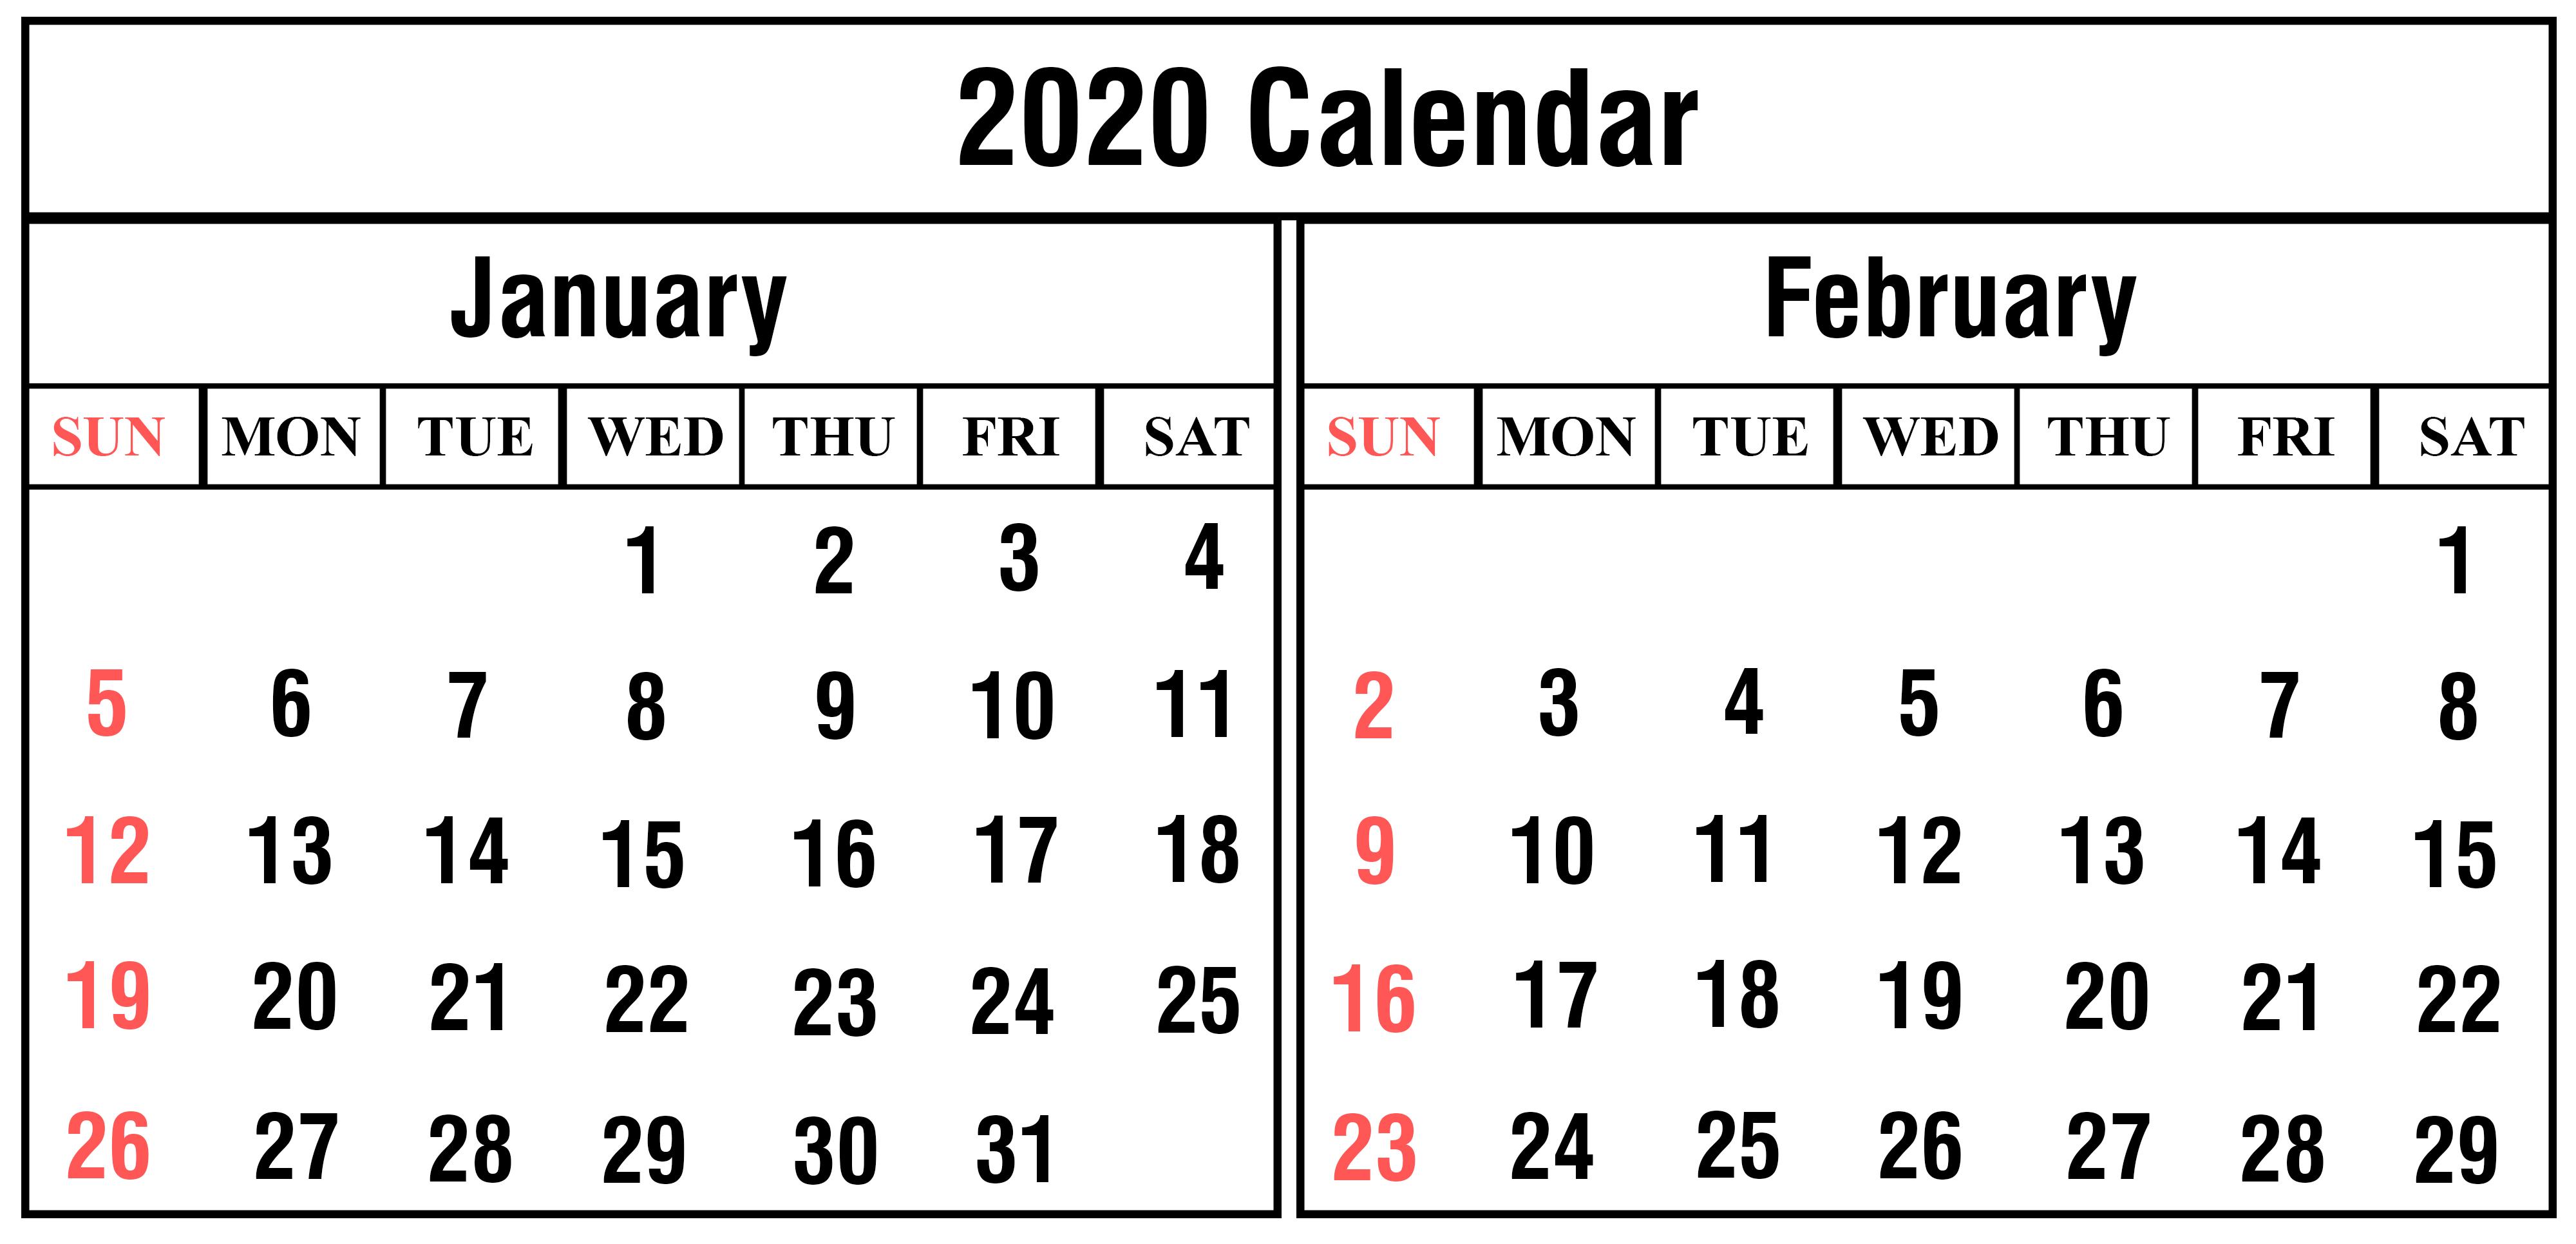 Free January and February 2020 Calendar